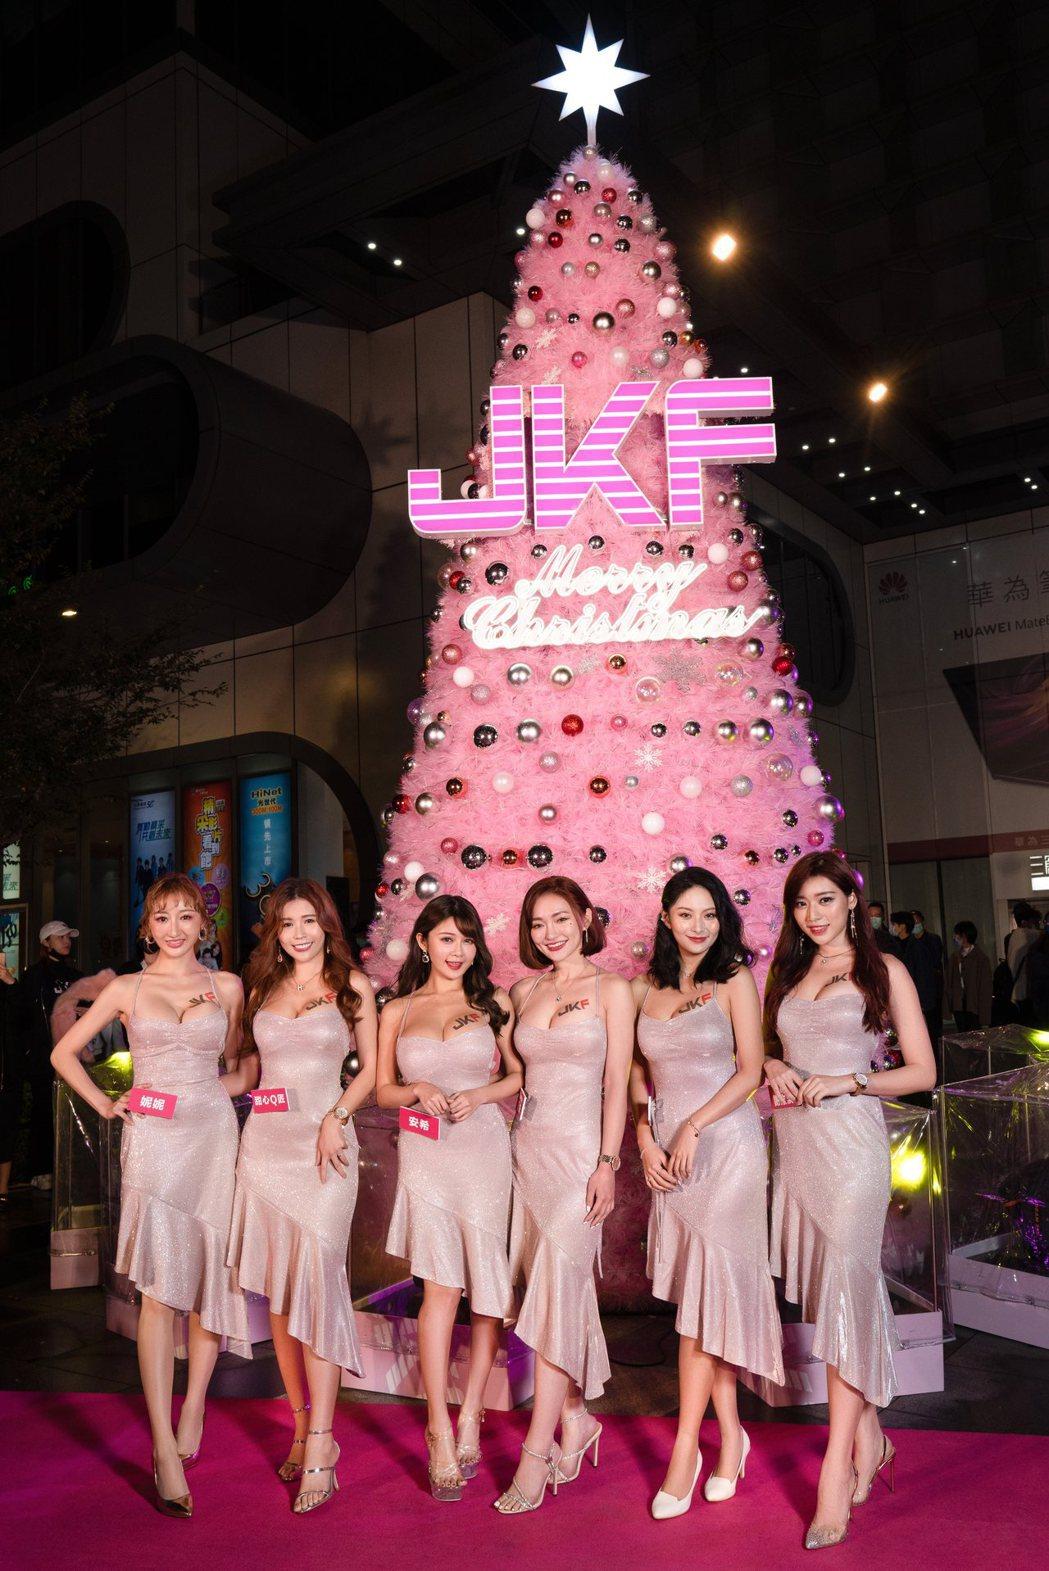 JKF女郎們盛裝出席點燈儀式。圖/JKF提供